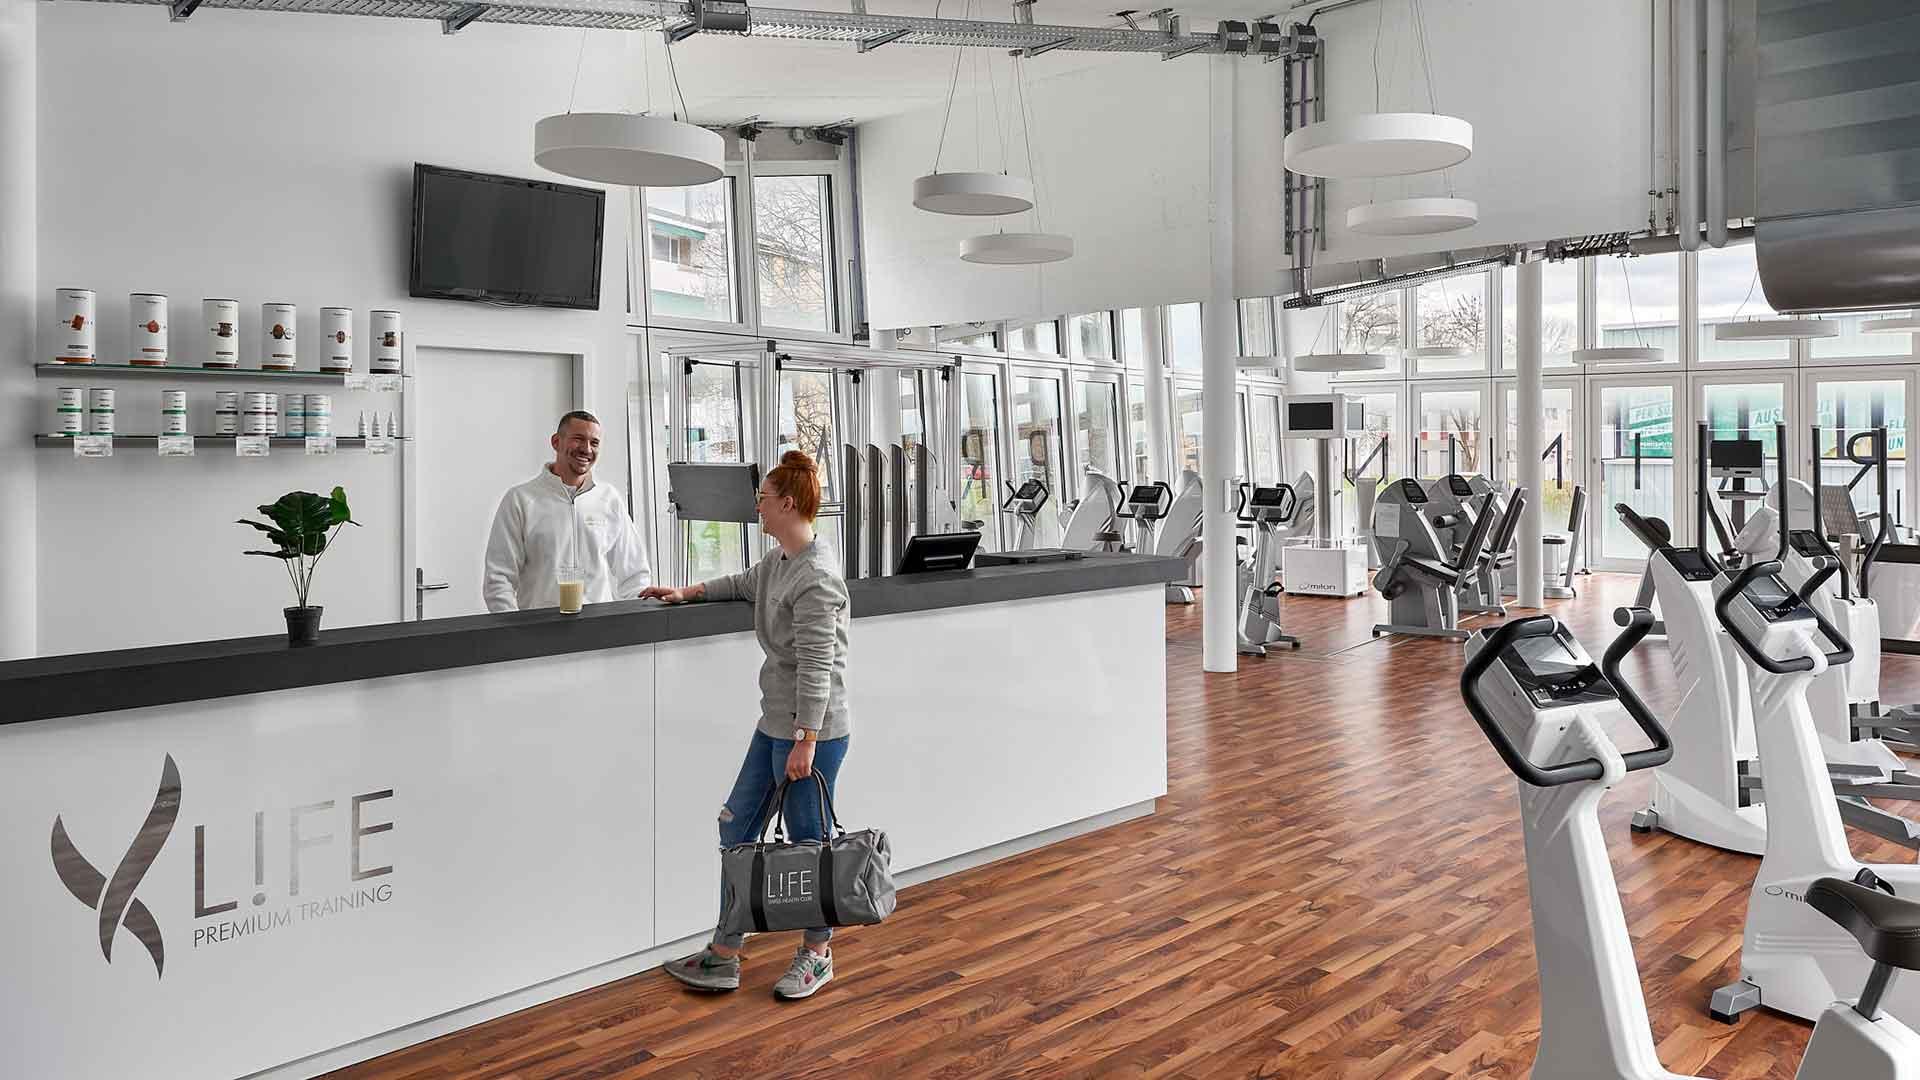 L!fe Health Fitness in Arlesheim